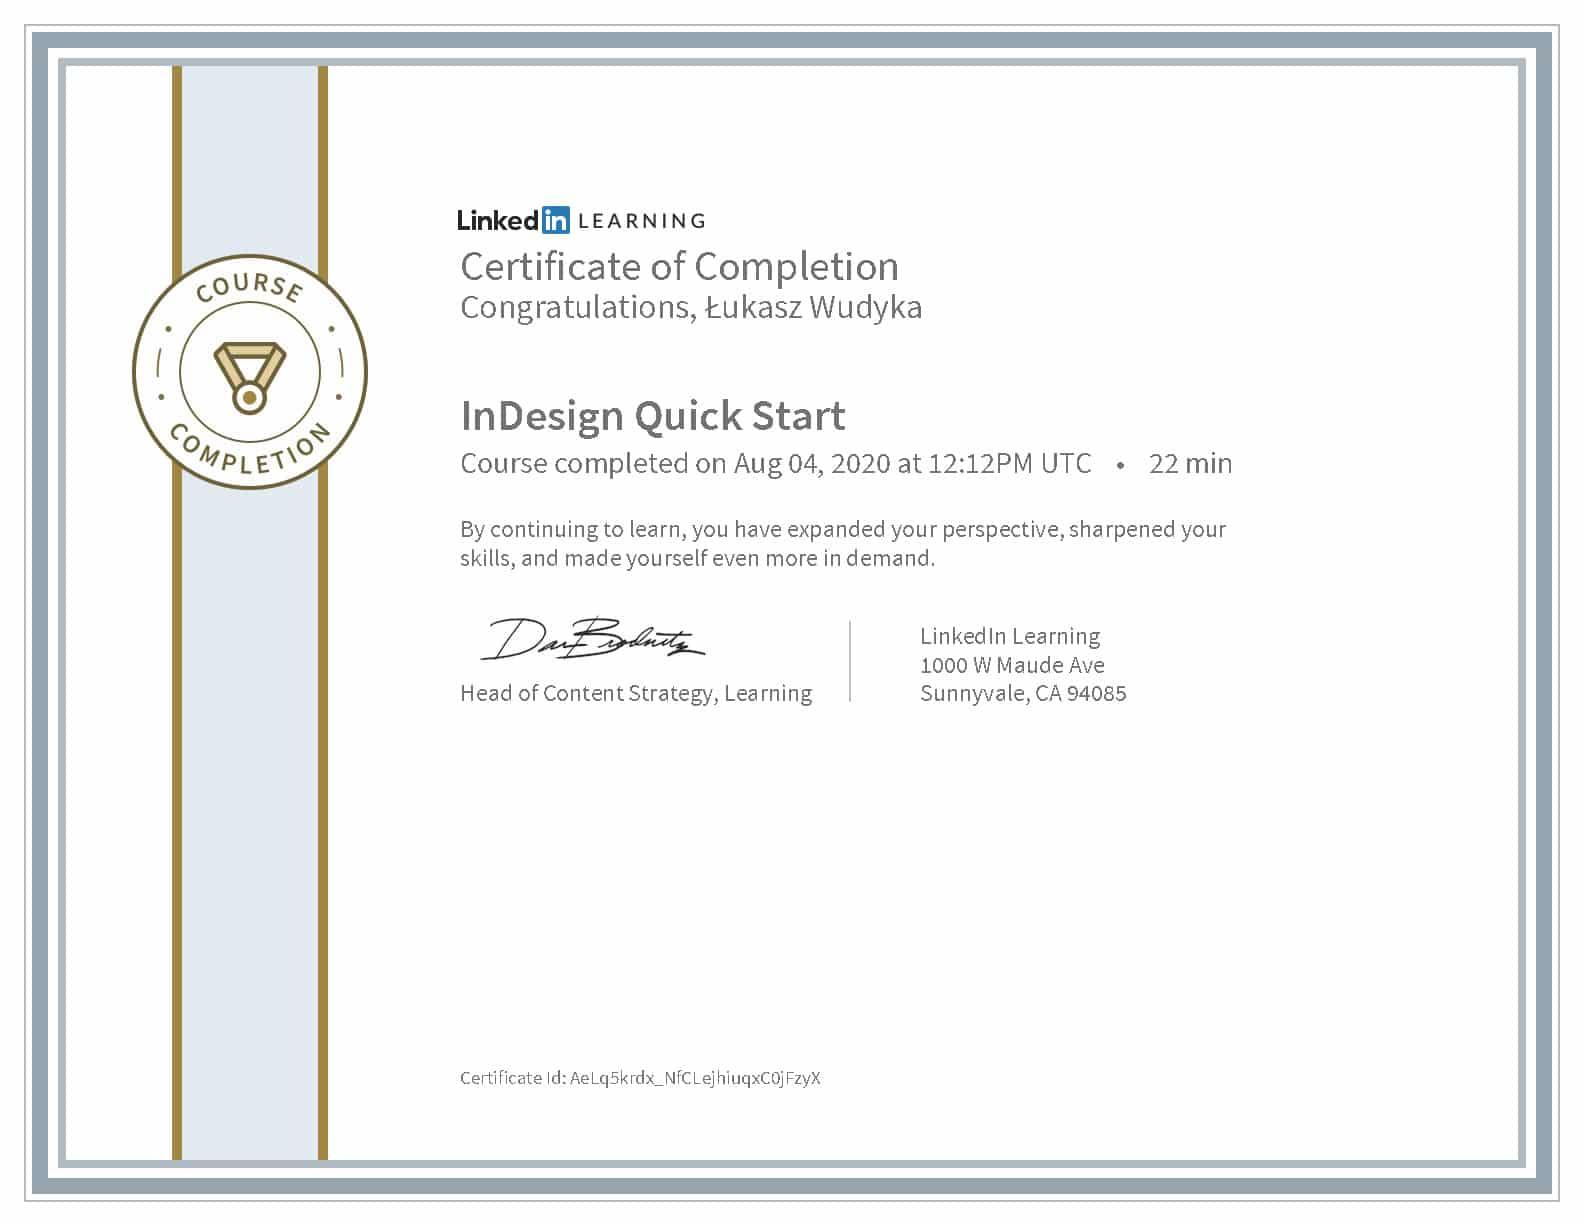 Łukasz Wudyka certyfikat LinkedIn InDesign Quick Start